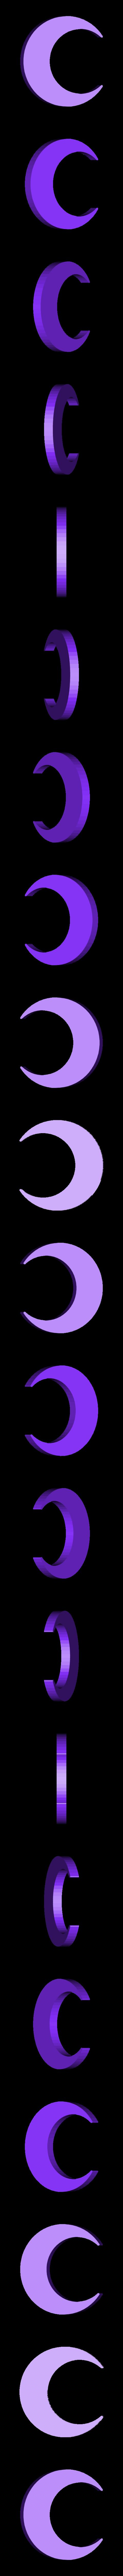 "pendant_1.stl Download free STL file Set ""Peacock Feather"" • Design to 3D print, TanyaAkinora"